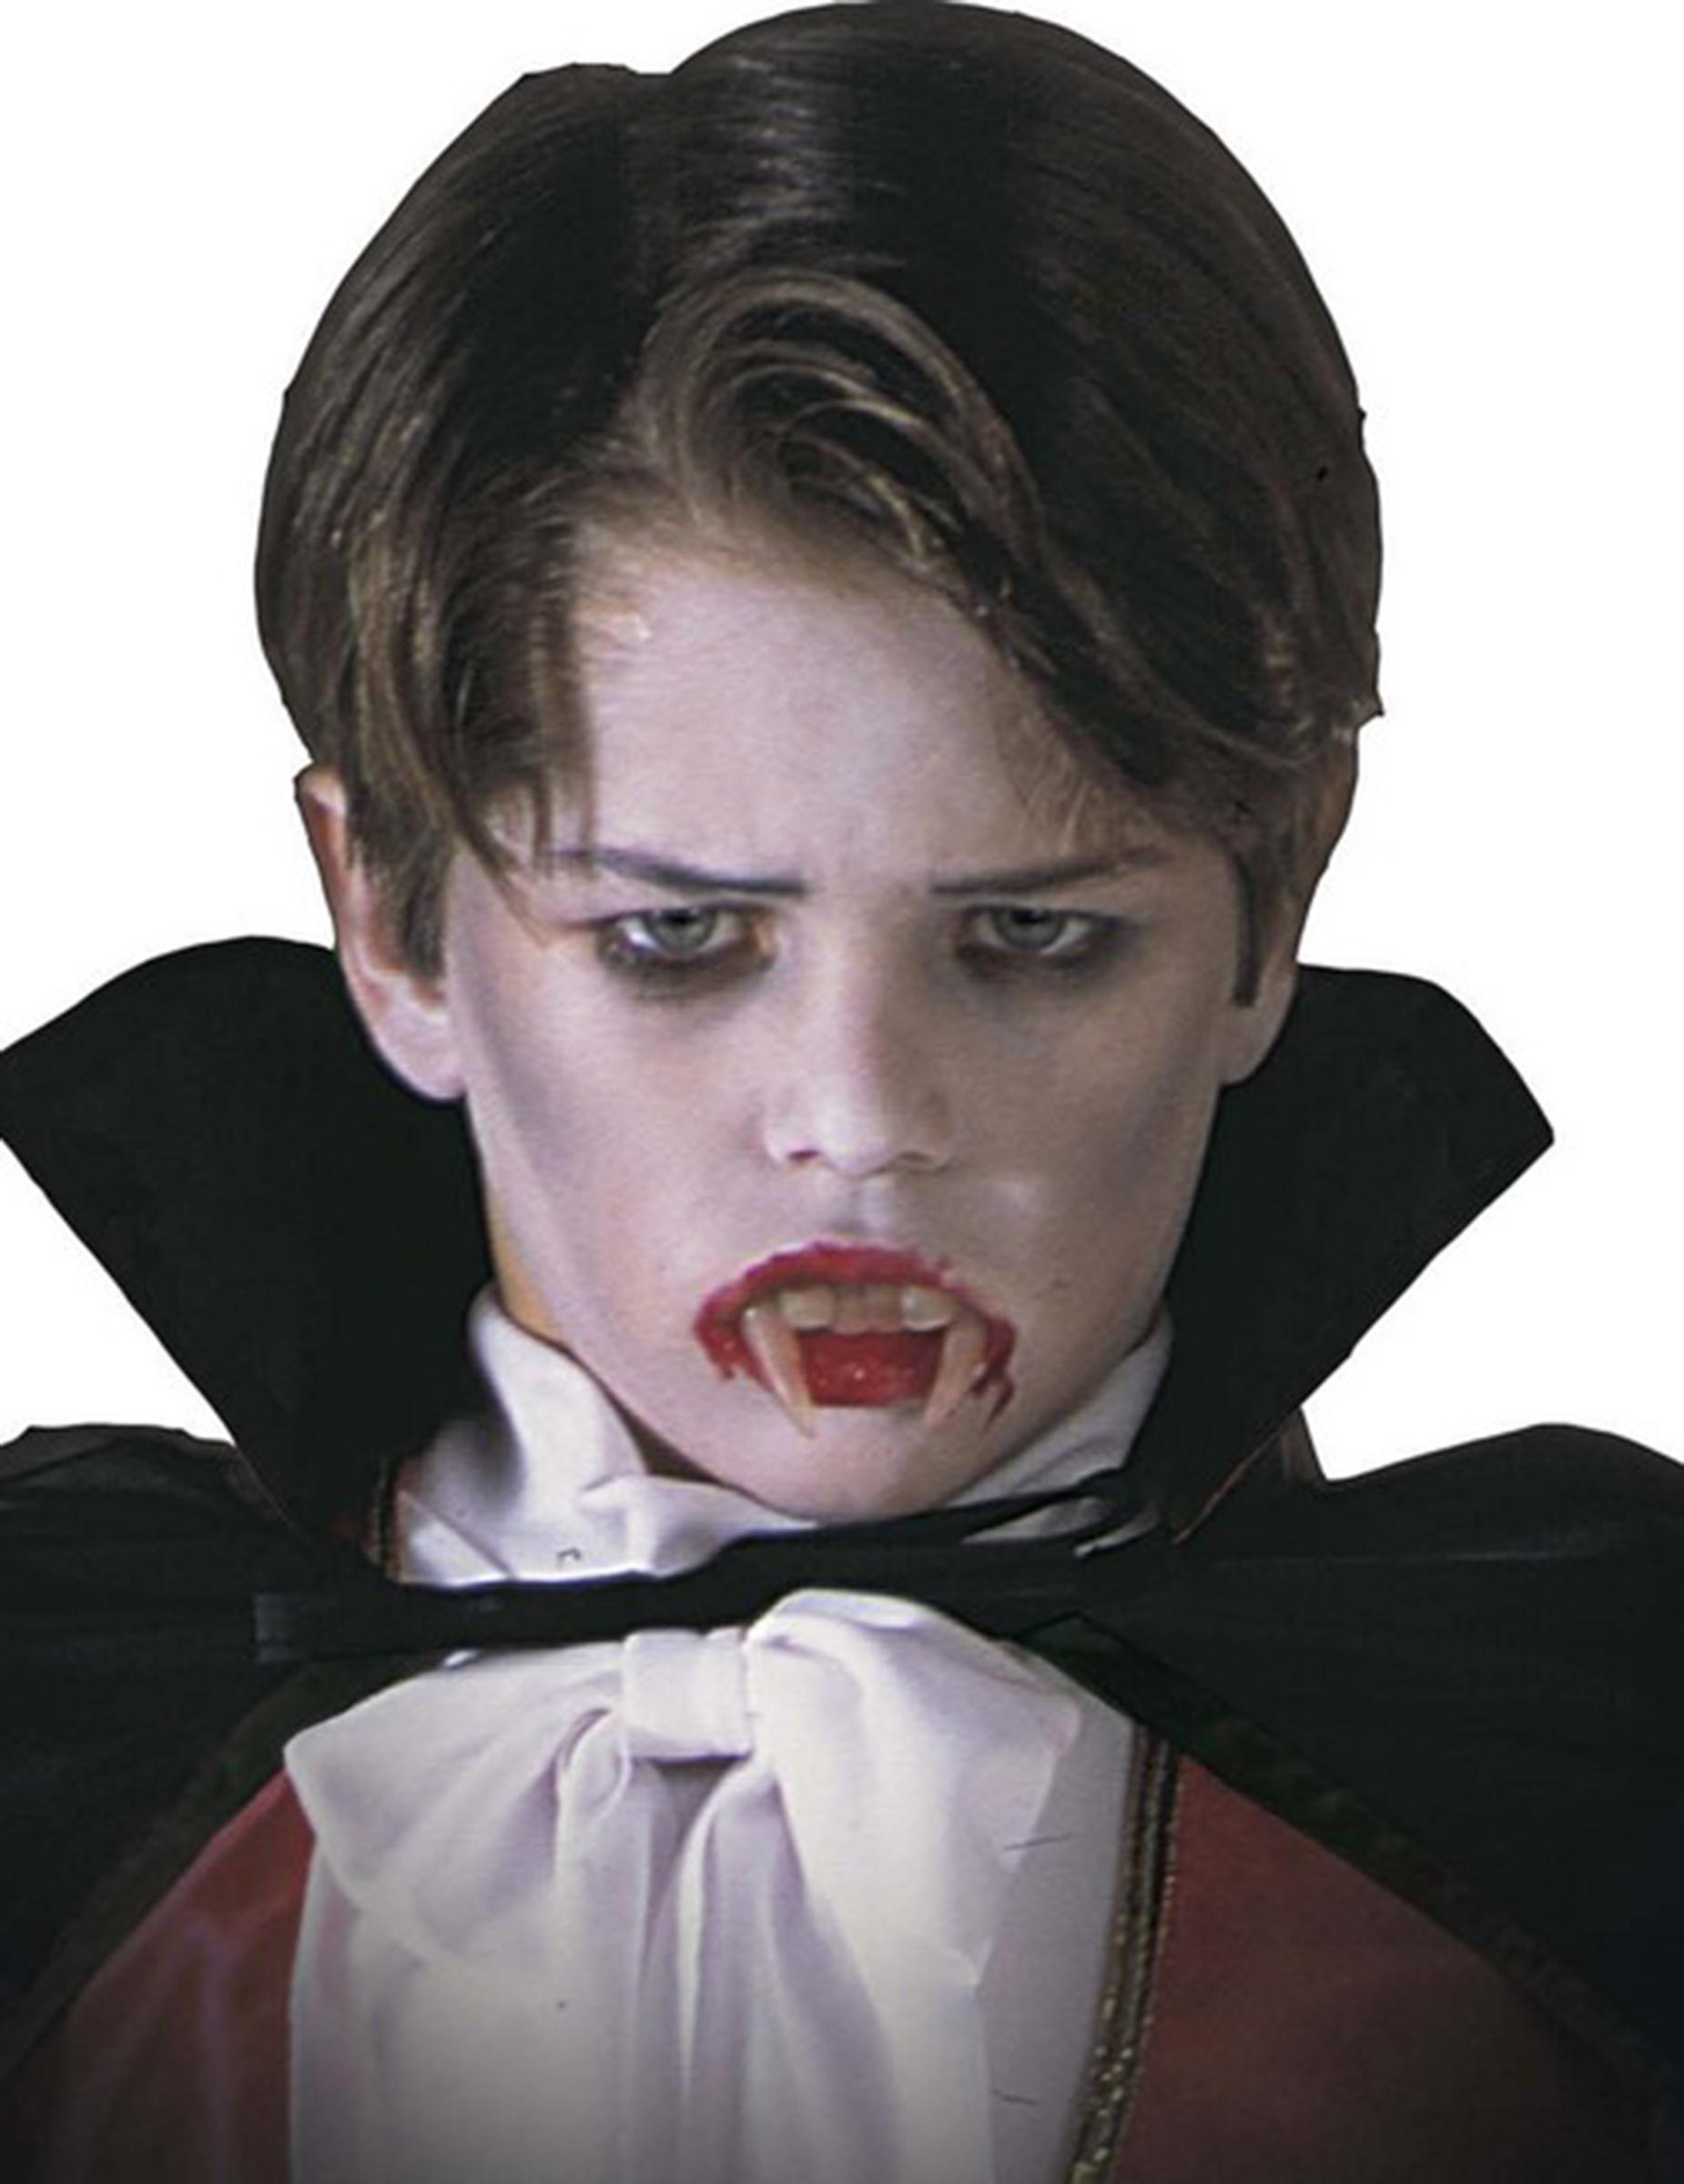 dentier vampire enfant halloween deguise toi achat de accessoires. Black Bedroom Furniture Sets. Home Design Ideas